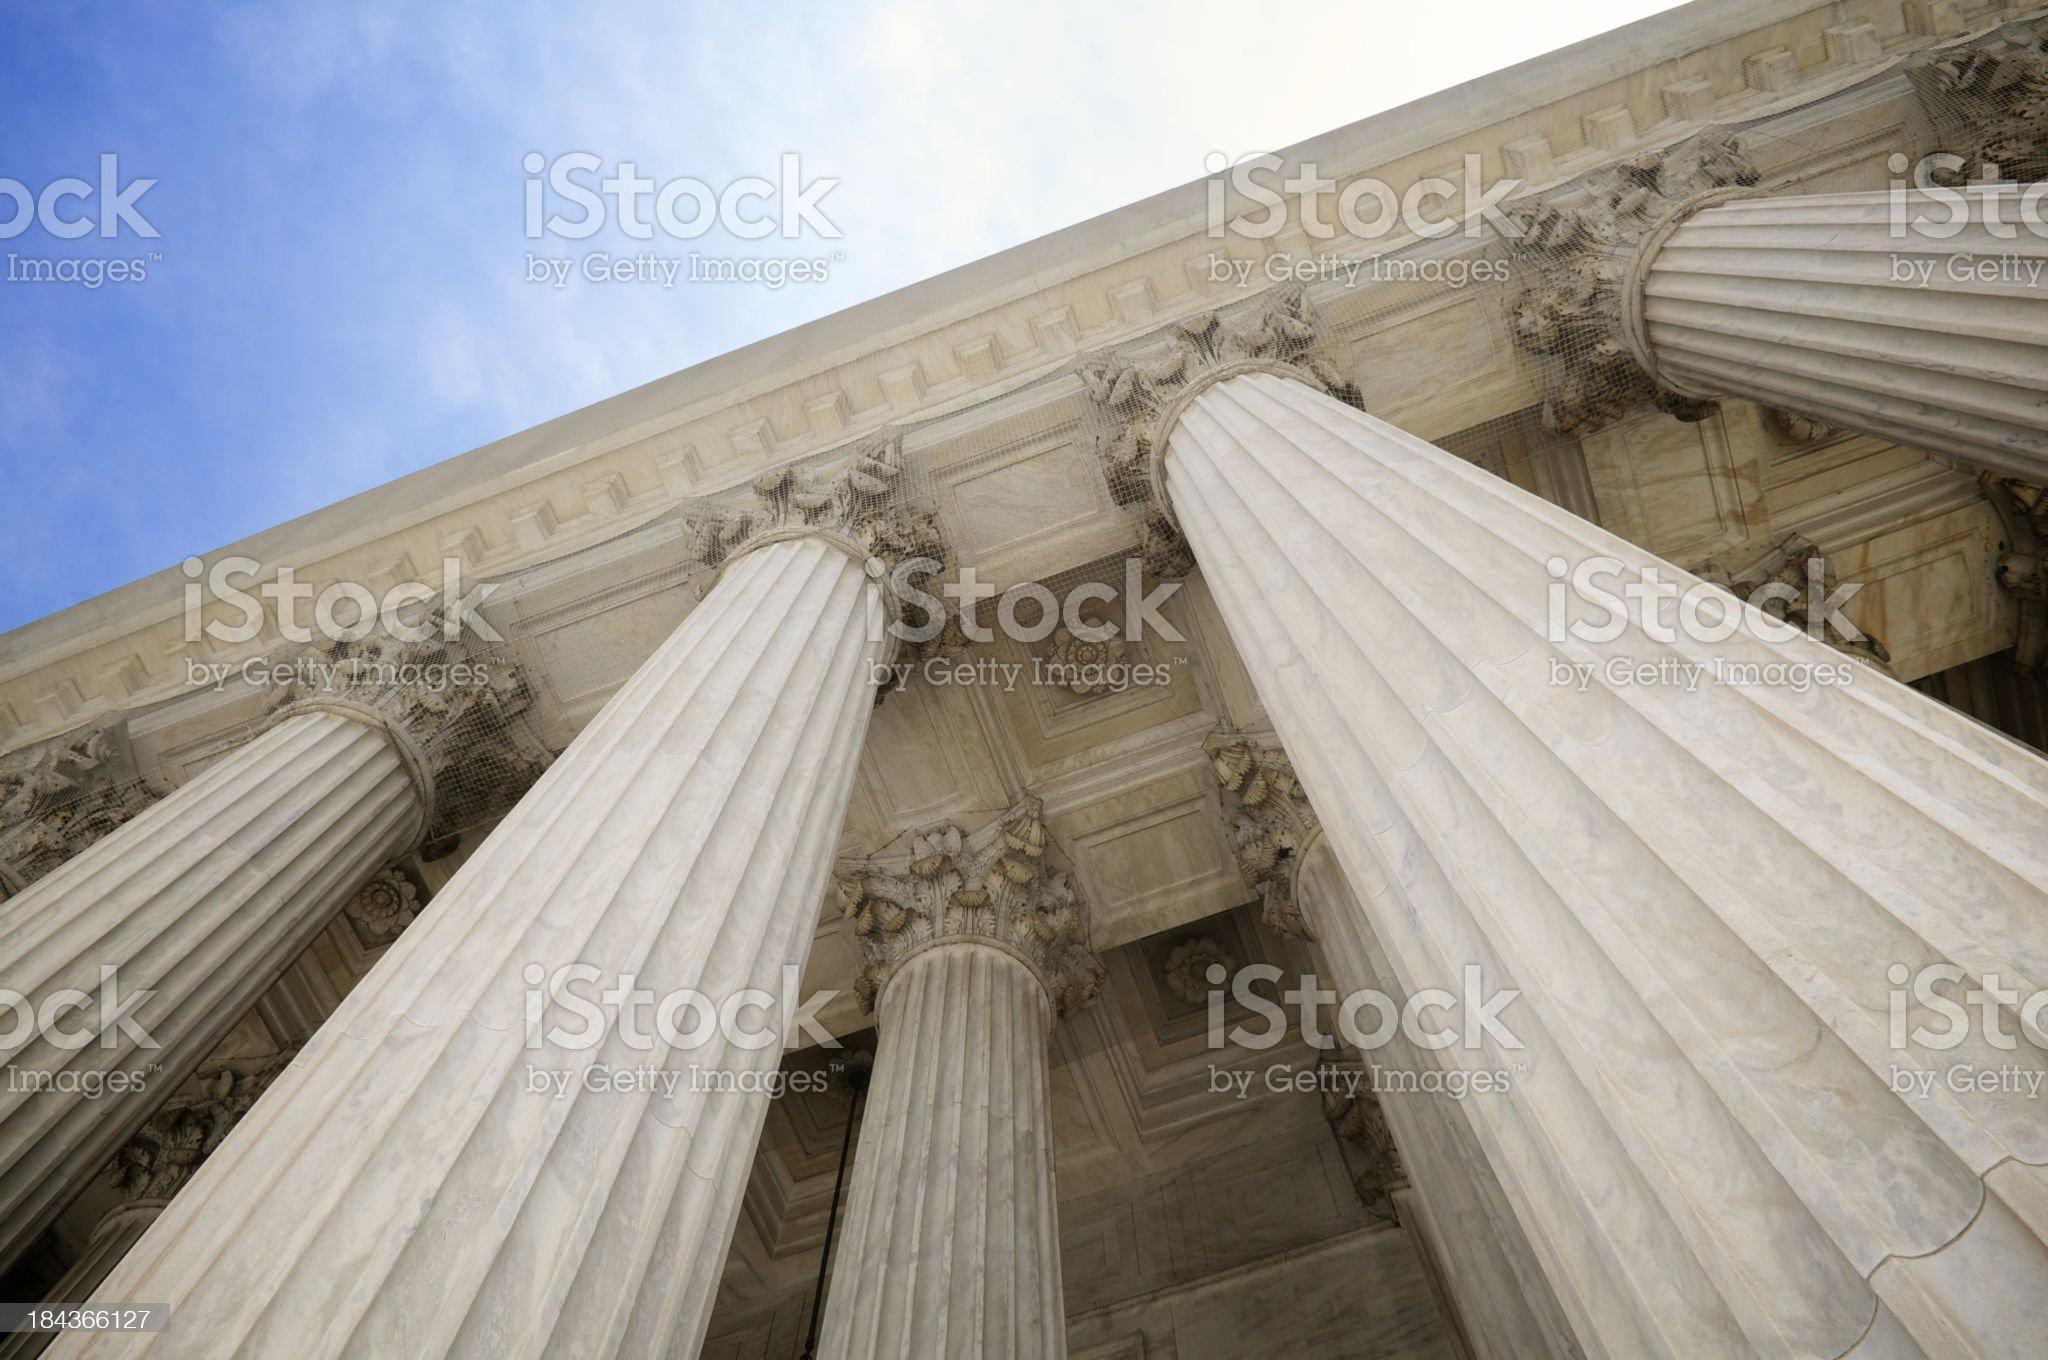 Grand Stone Columns of USA Supreme Court Building Washington DC royalty-free stock photo